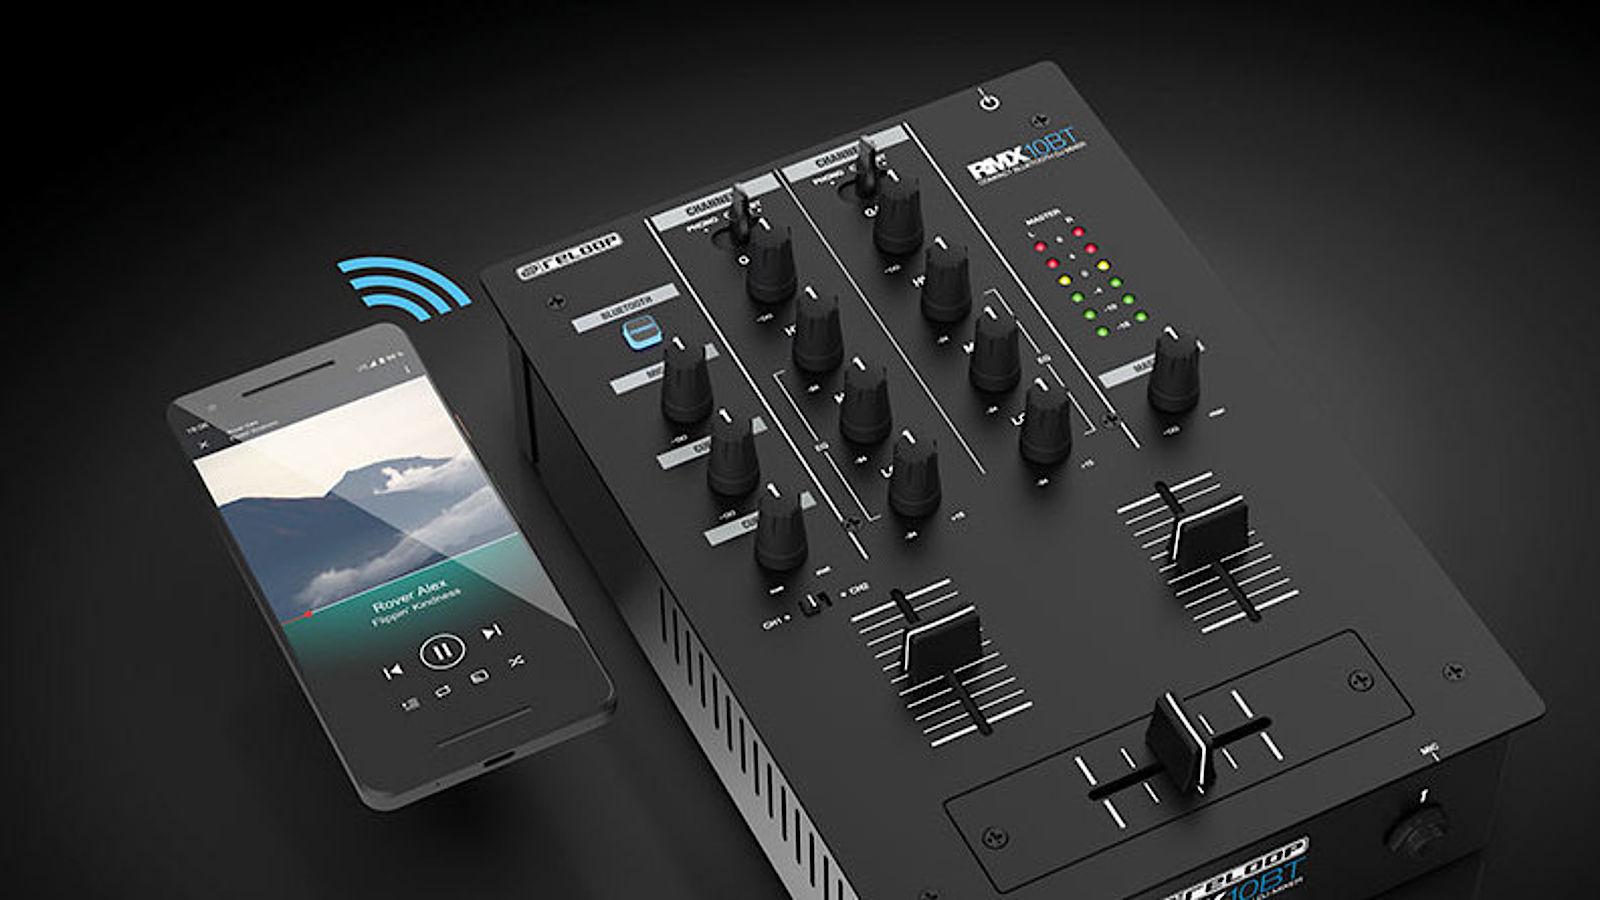 Reloop präsentiert den ersten DJ-Mixer mit 2 Bluetooth-Kanälen 0m 0d - DJ Mag Germany